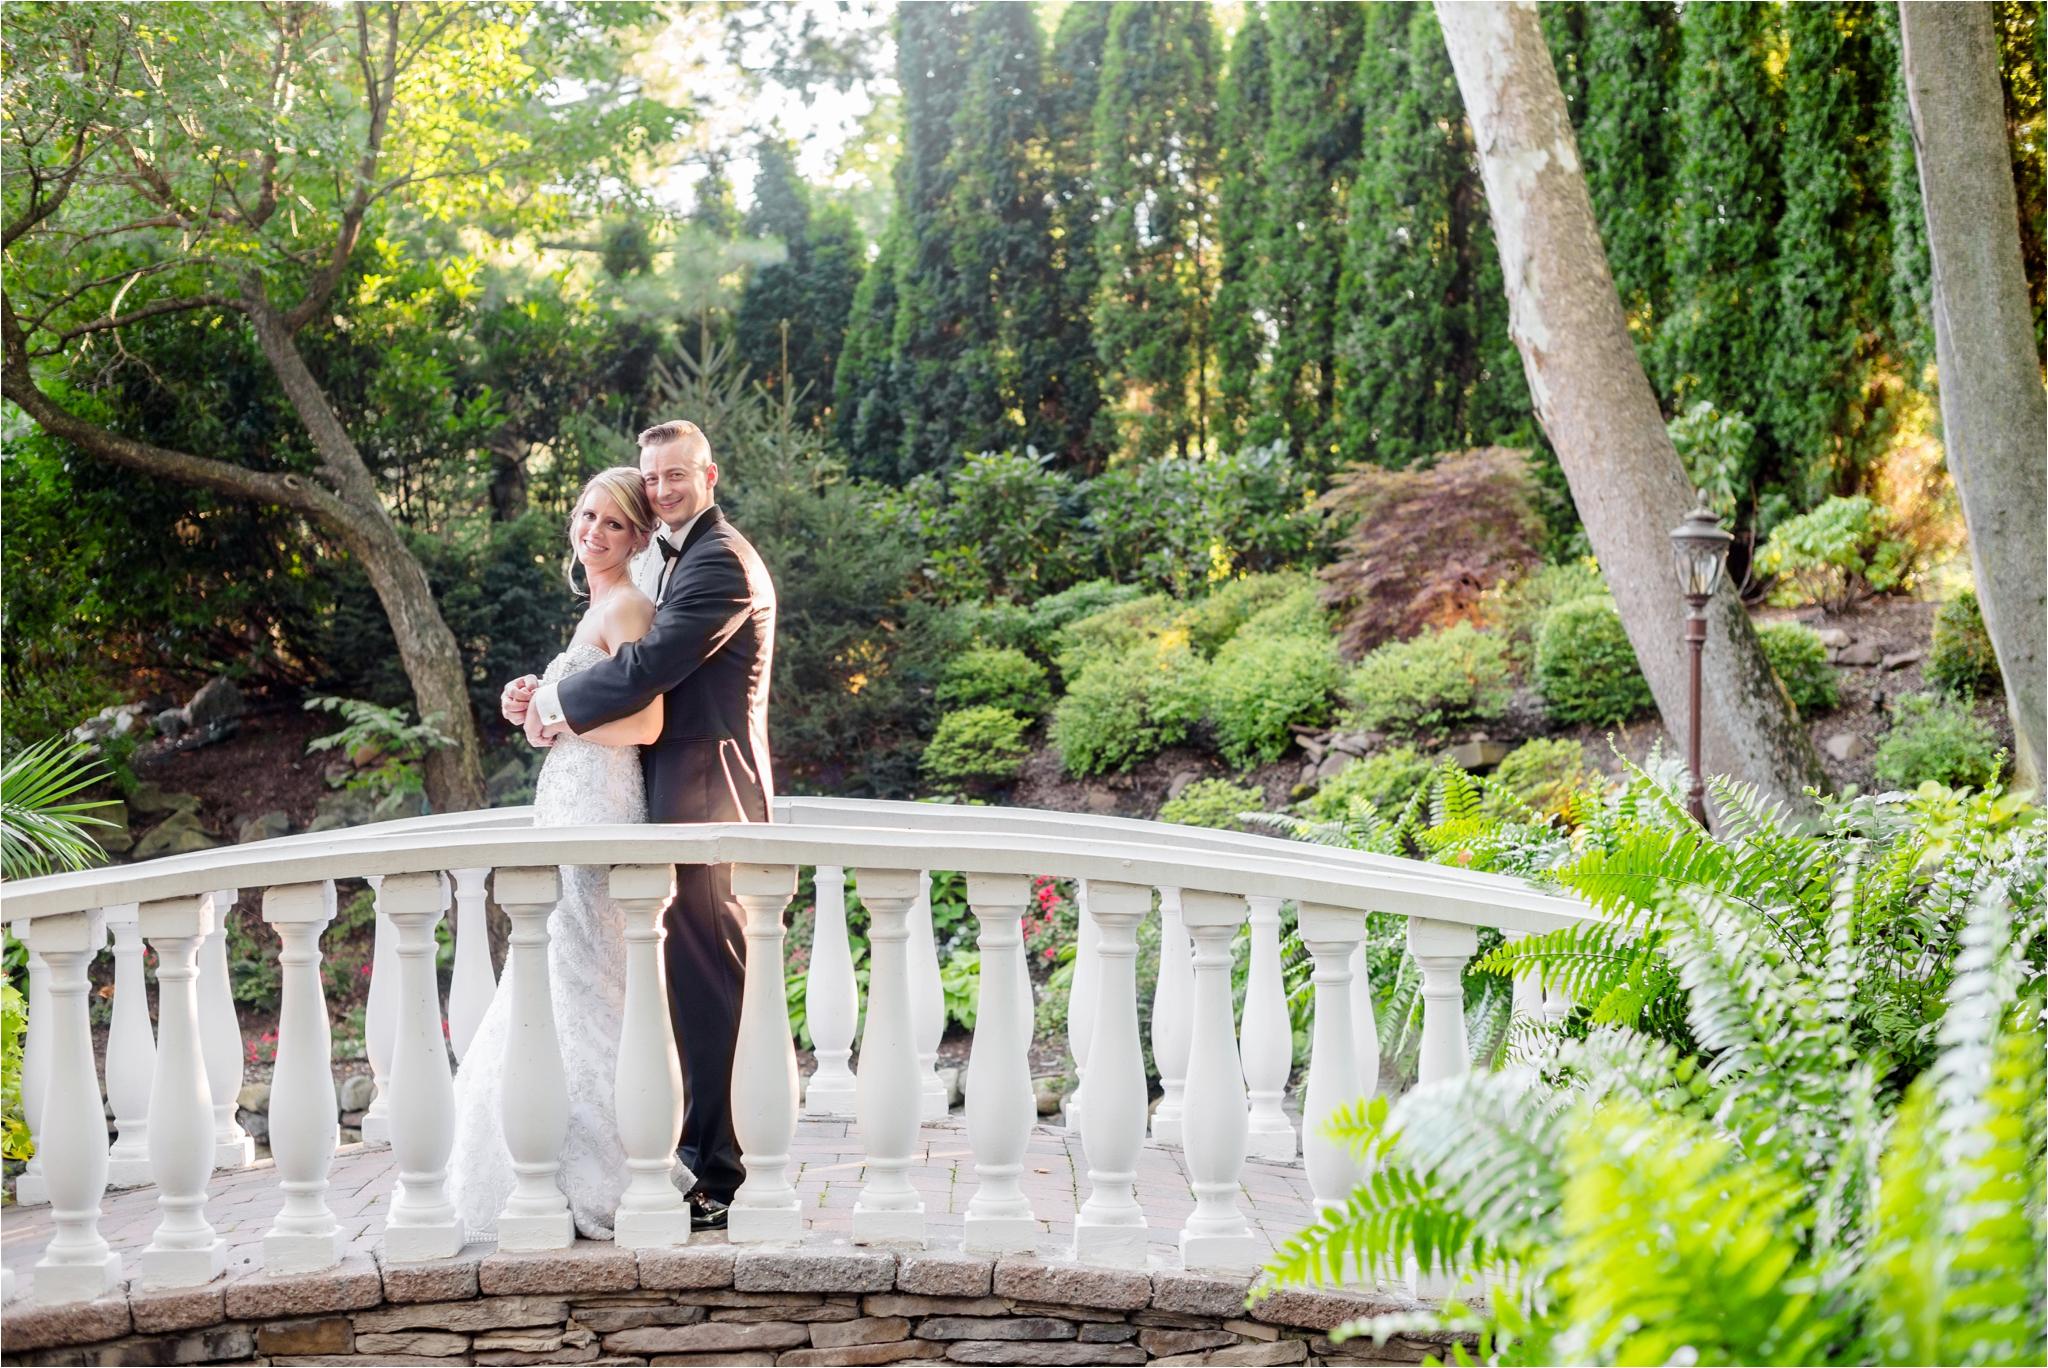 the-nifty-fifty-lens-jaclyn-auletta-photography-blog-north-carolina-wedding-photographer_0003.jpg